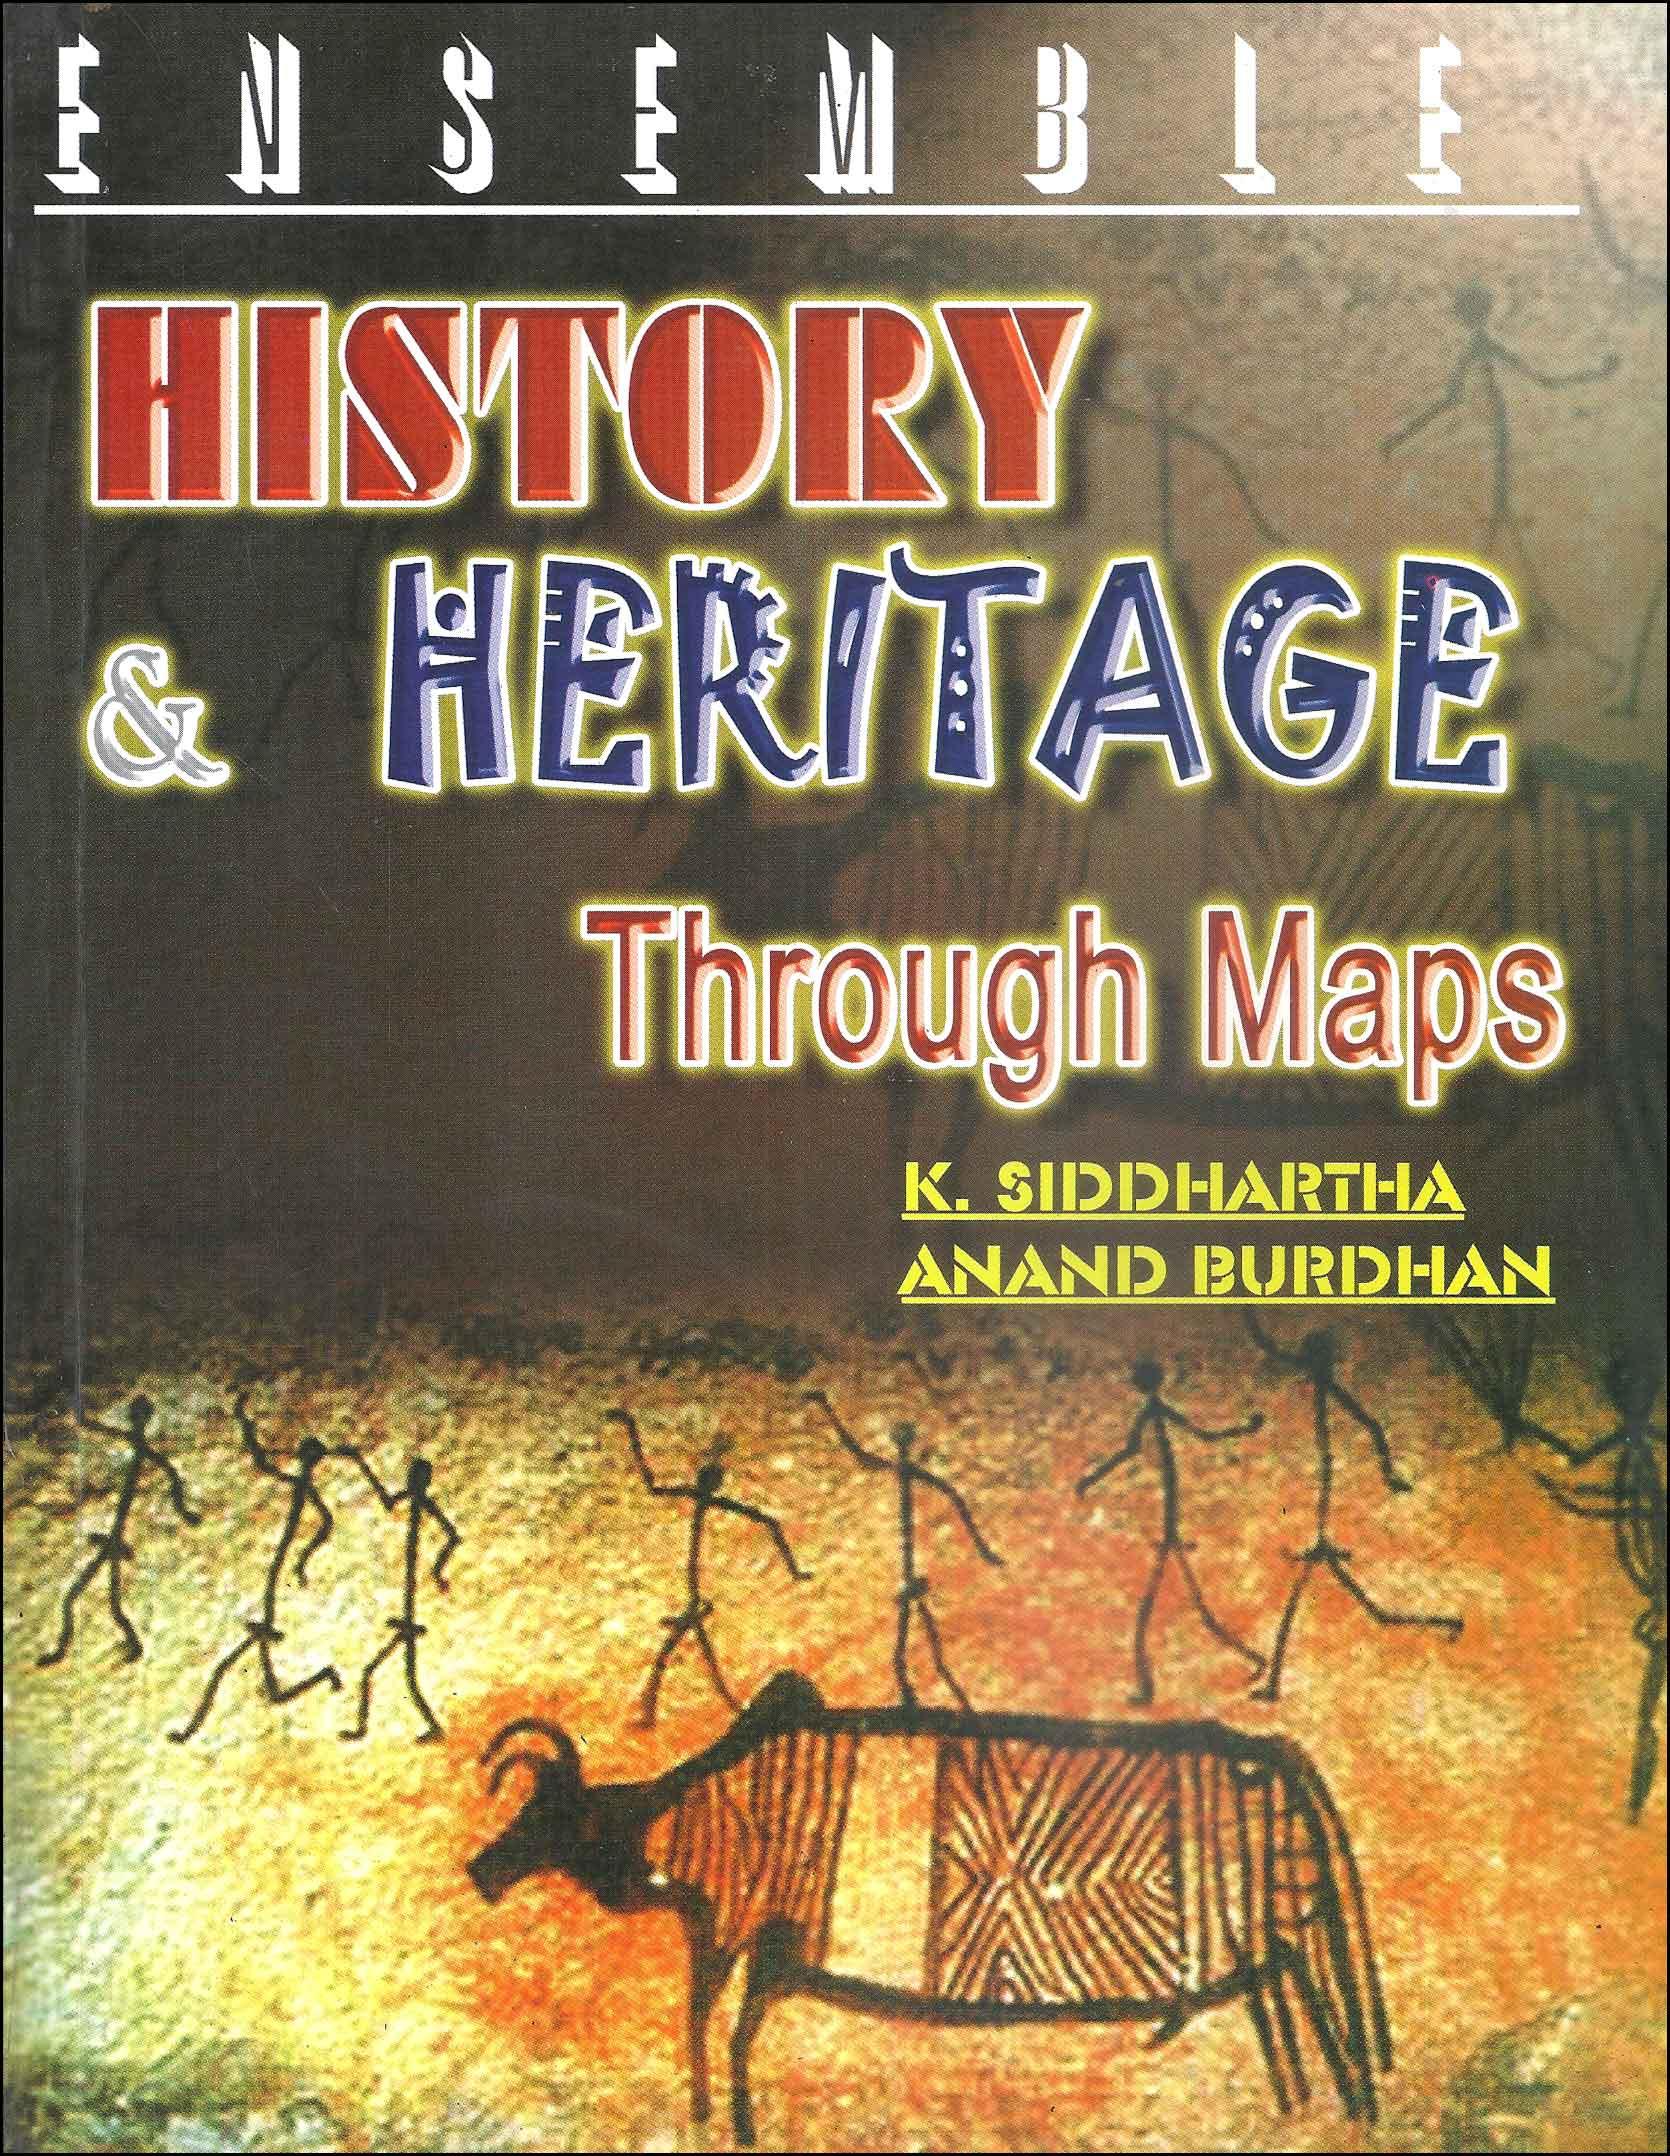 Books :: Ensemble History Heritage Through Maps